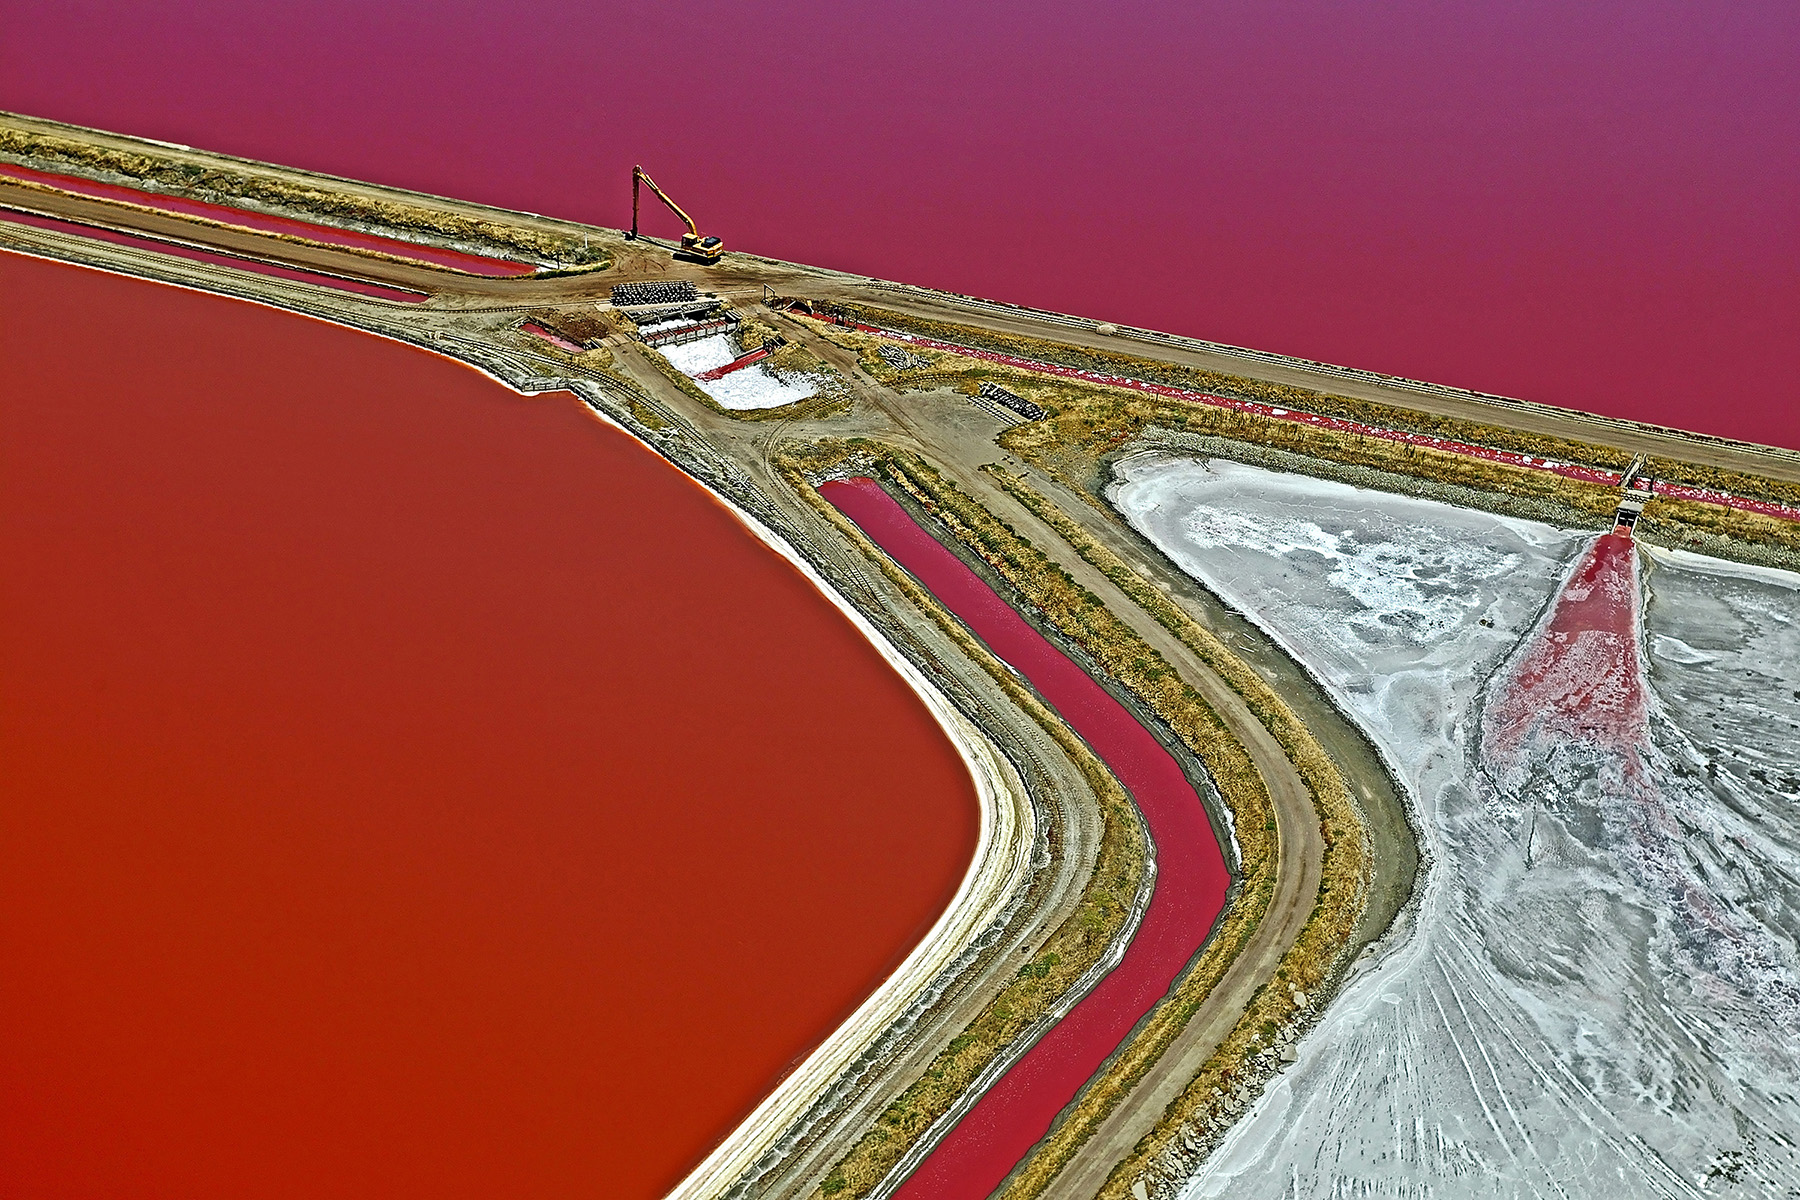 Colin_McRae_Sf Bay Salt Ponds_Wine Salt_5.jpg